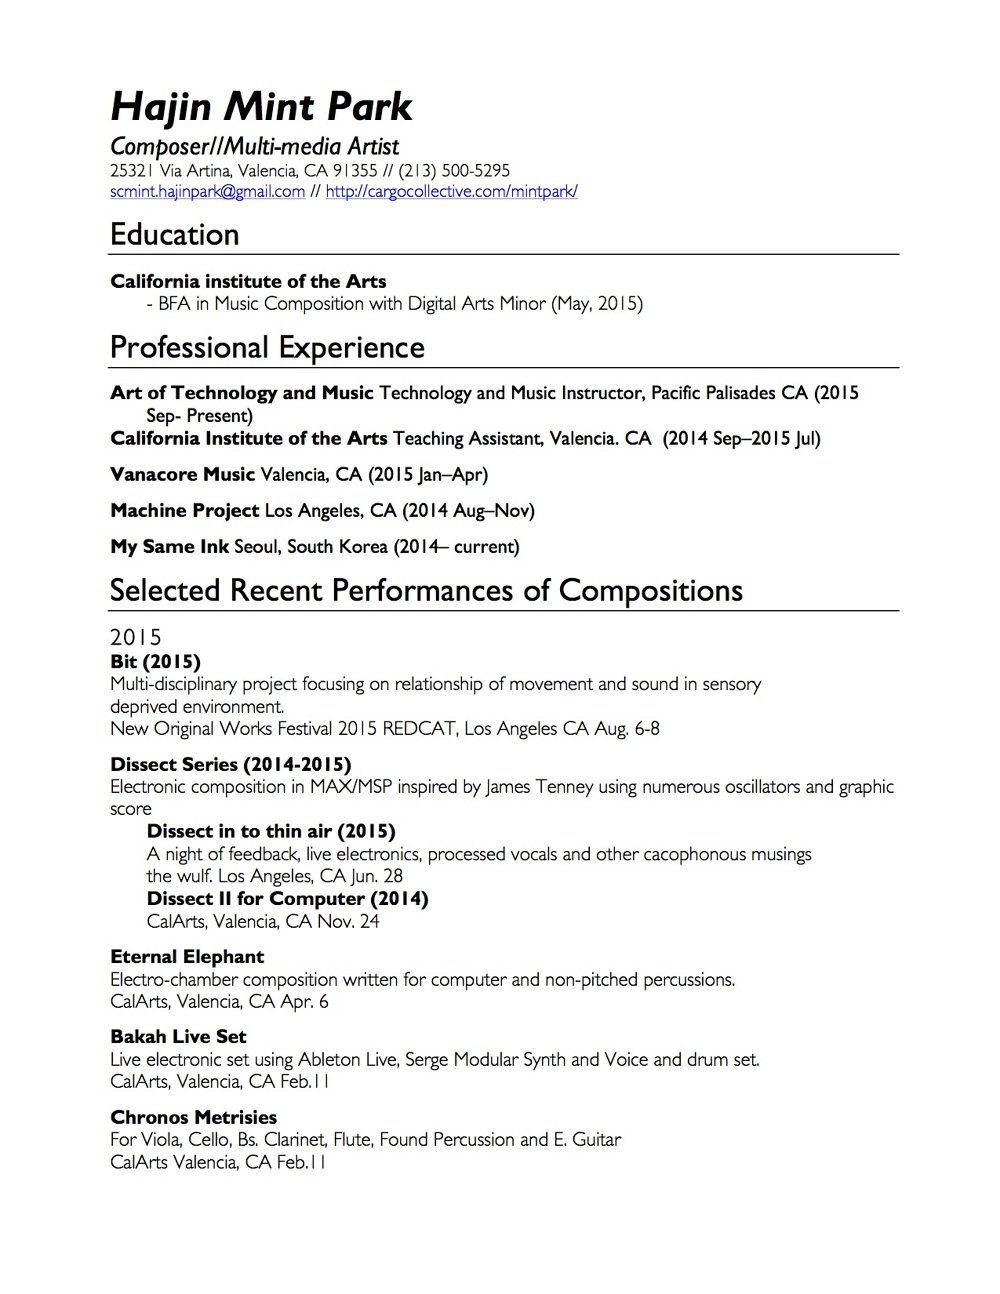 Cv Resume Mint Park